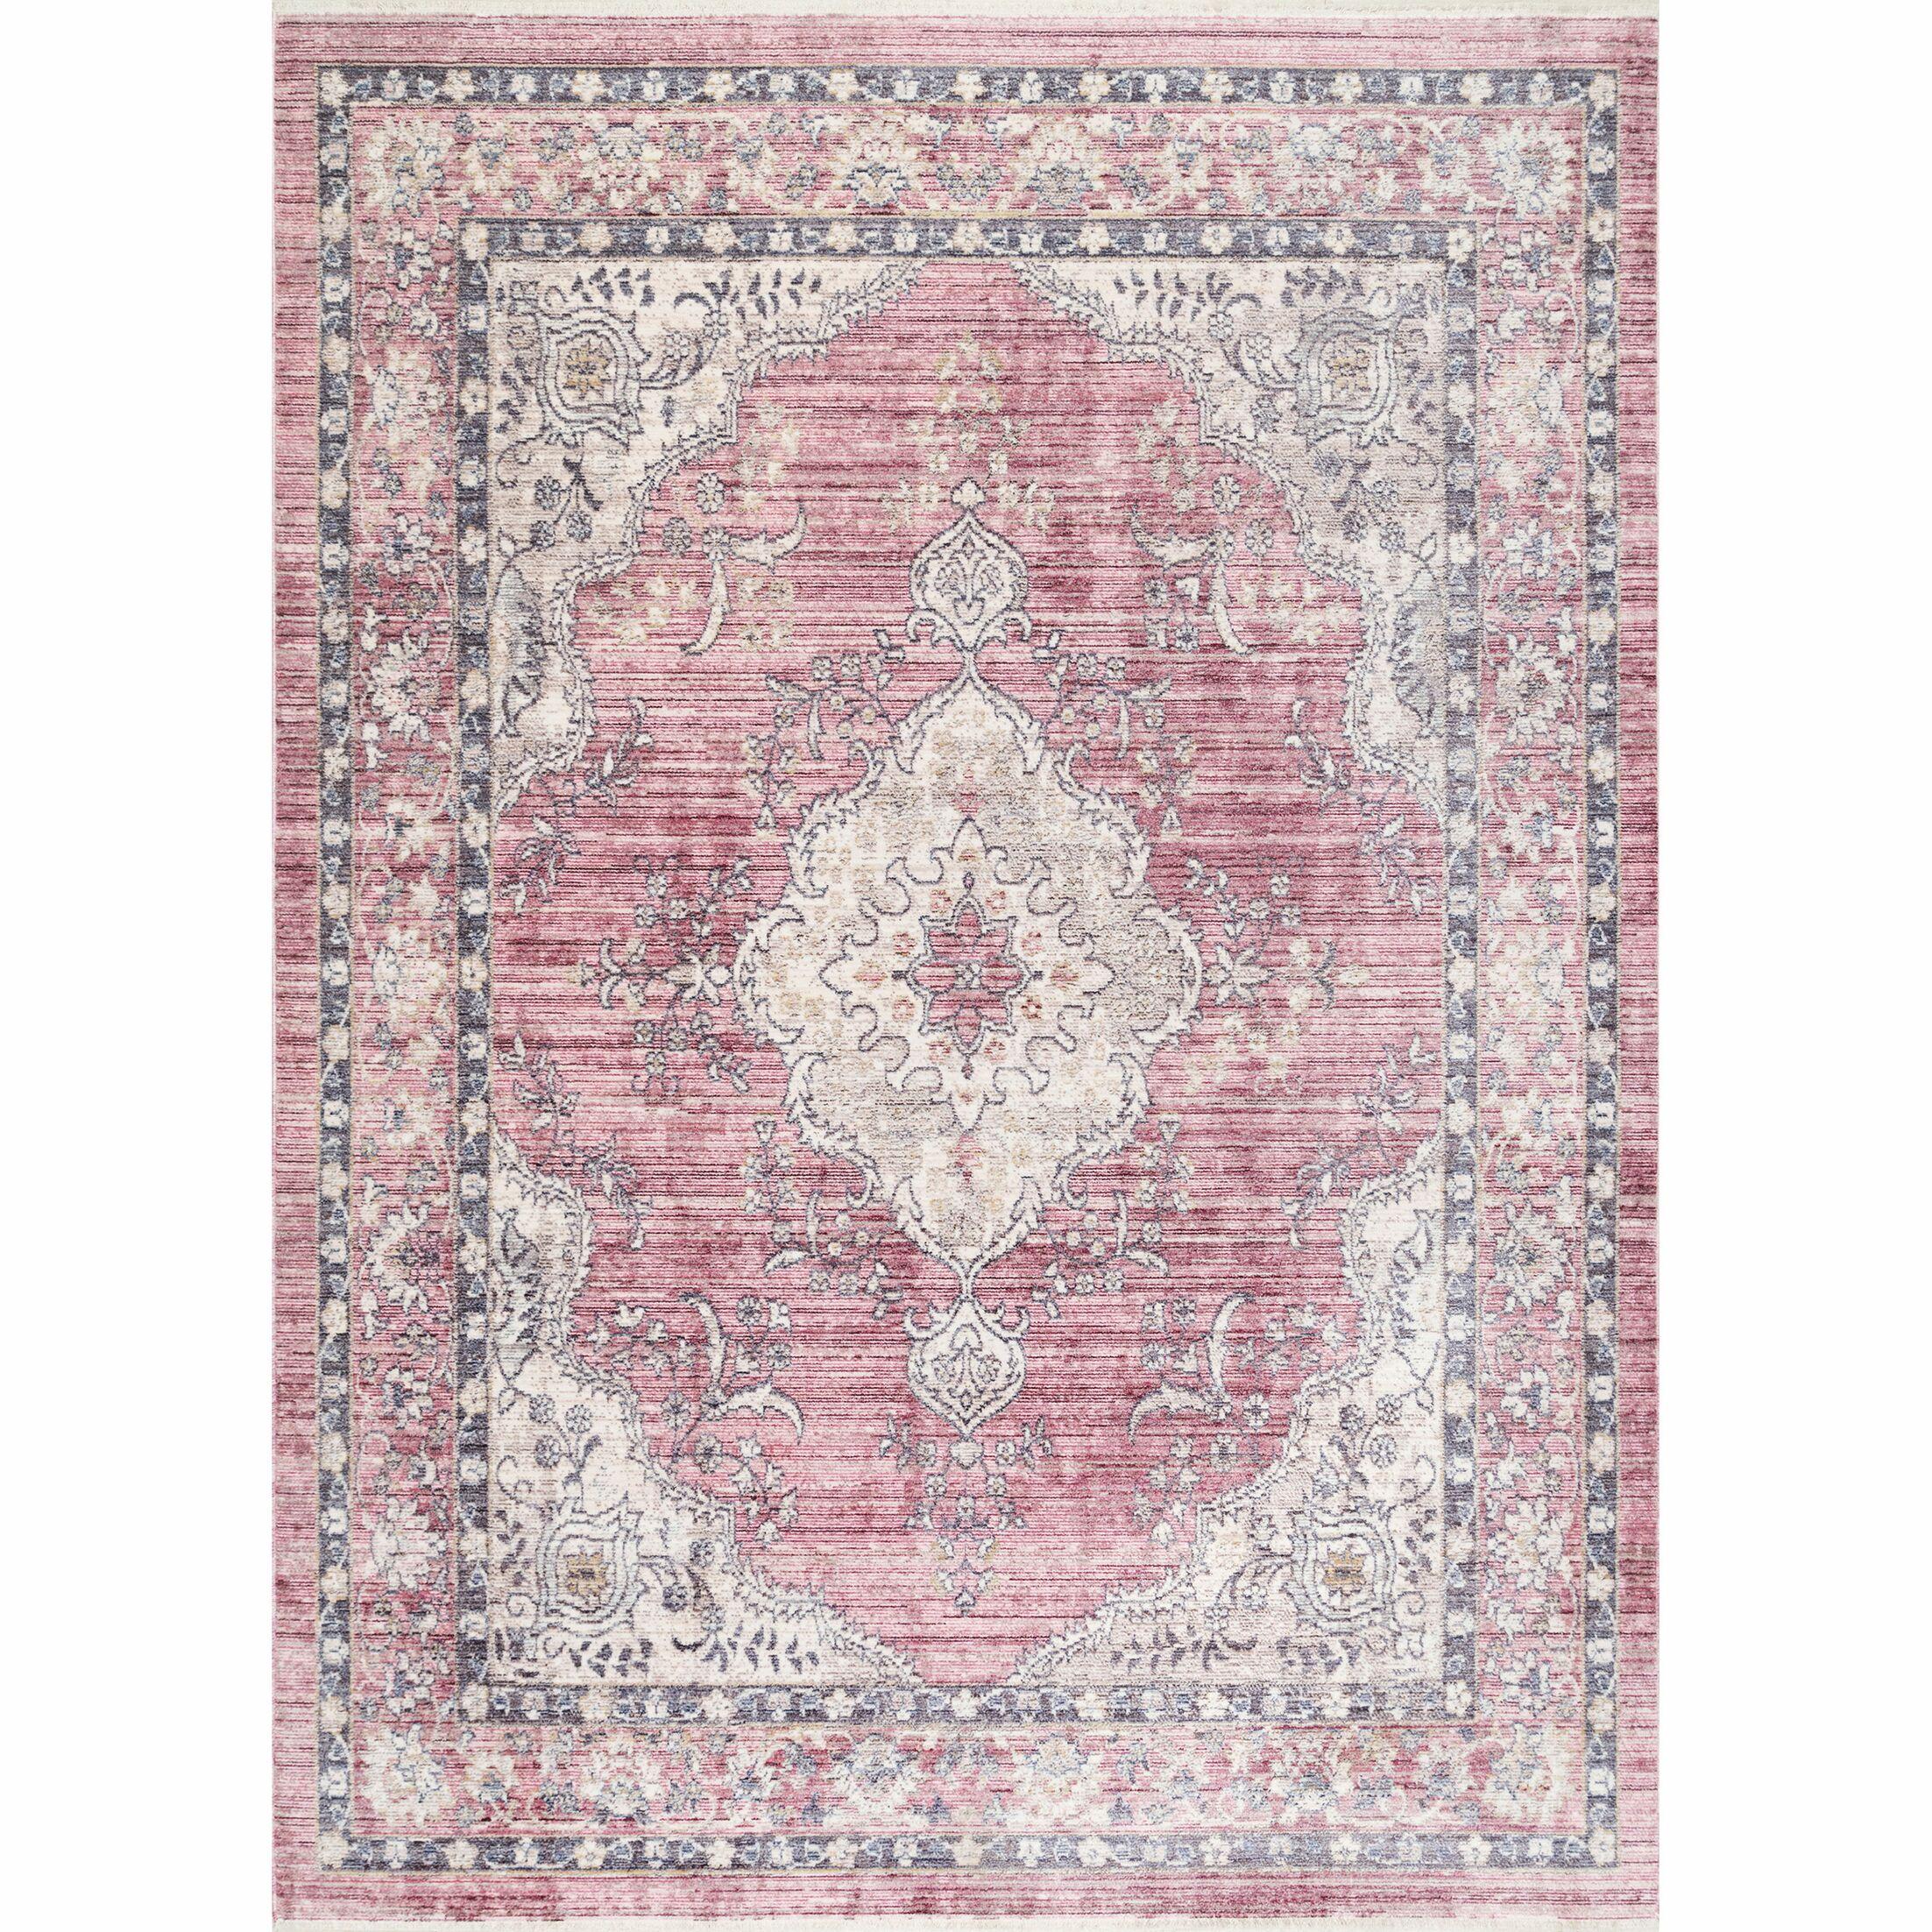 Wachapreague Pink Area Rug Rug Size: Rectangle 5' 3